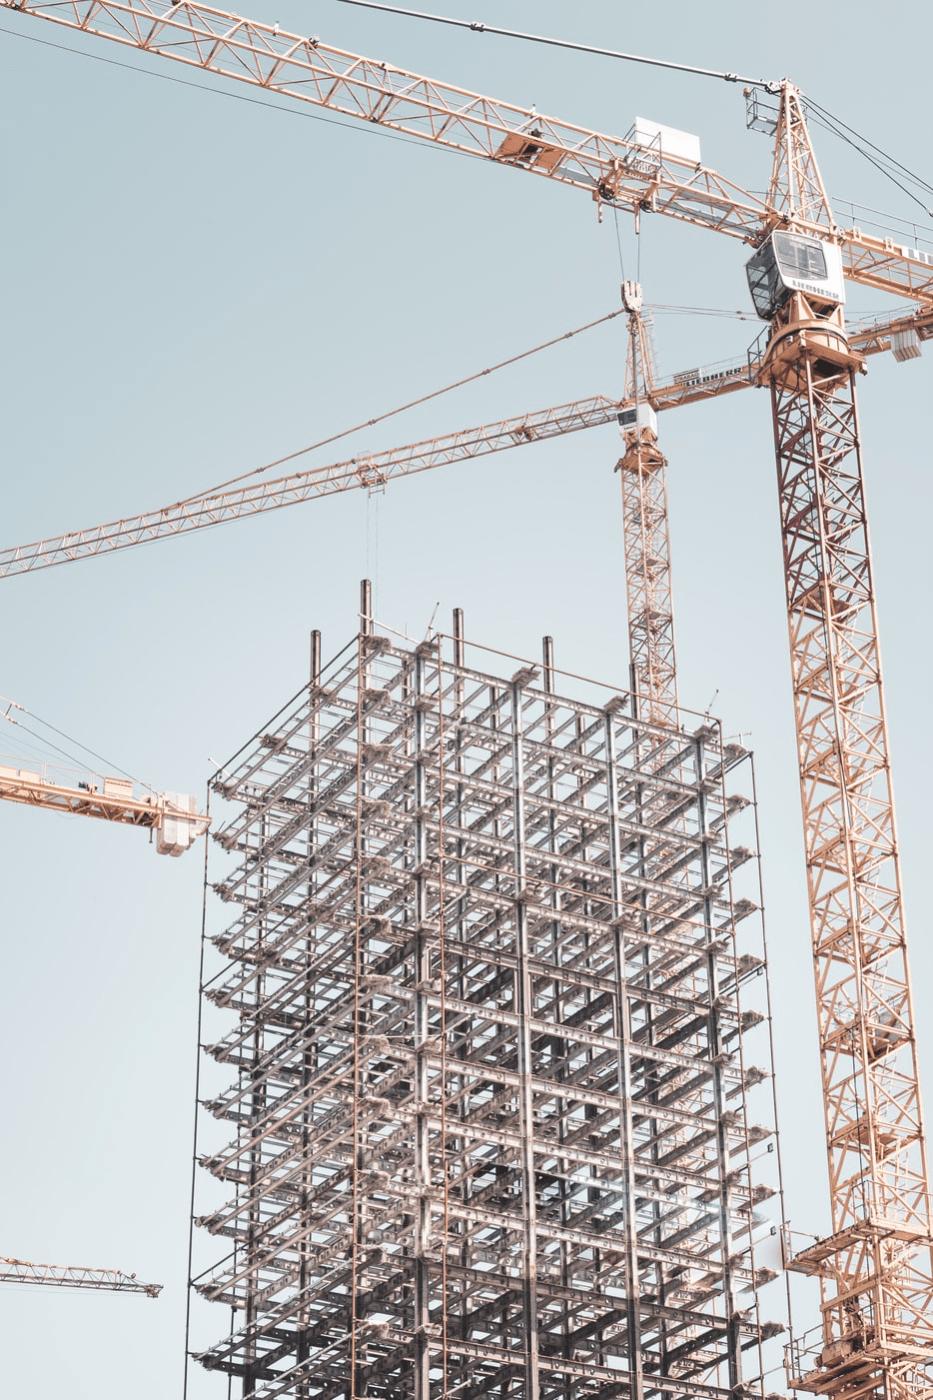 Infrastructure revolution - construction